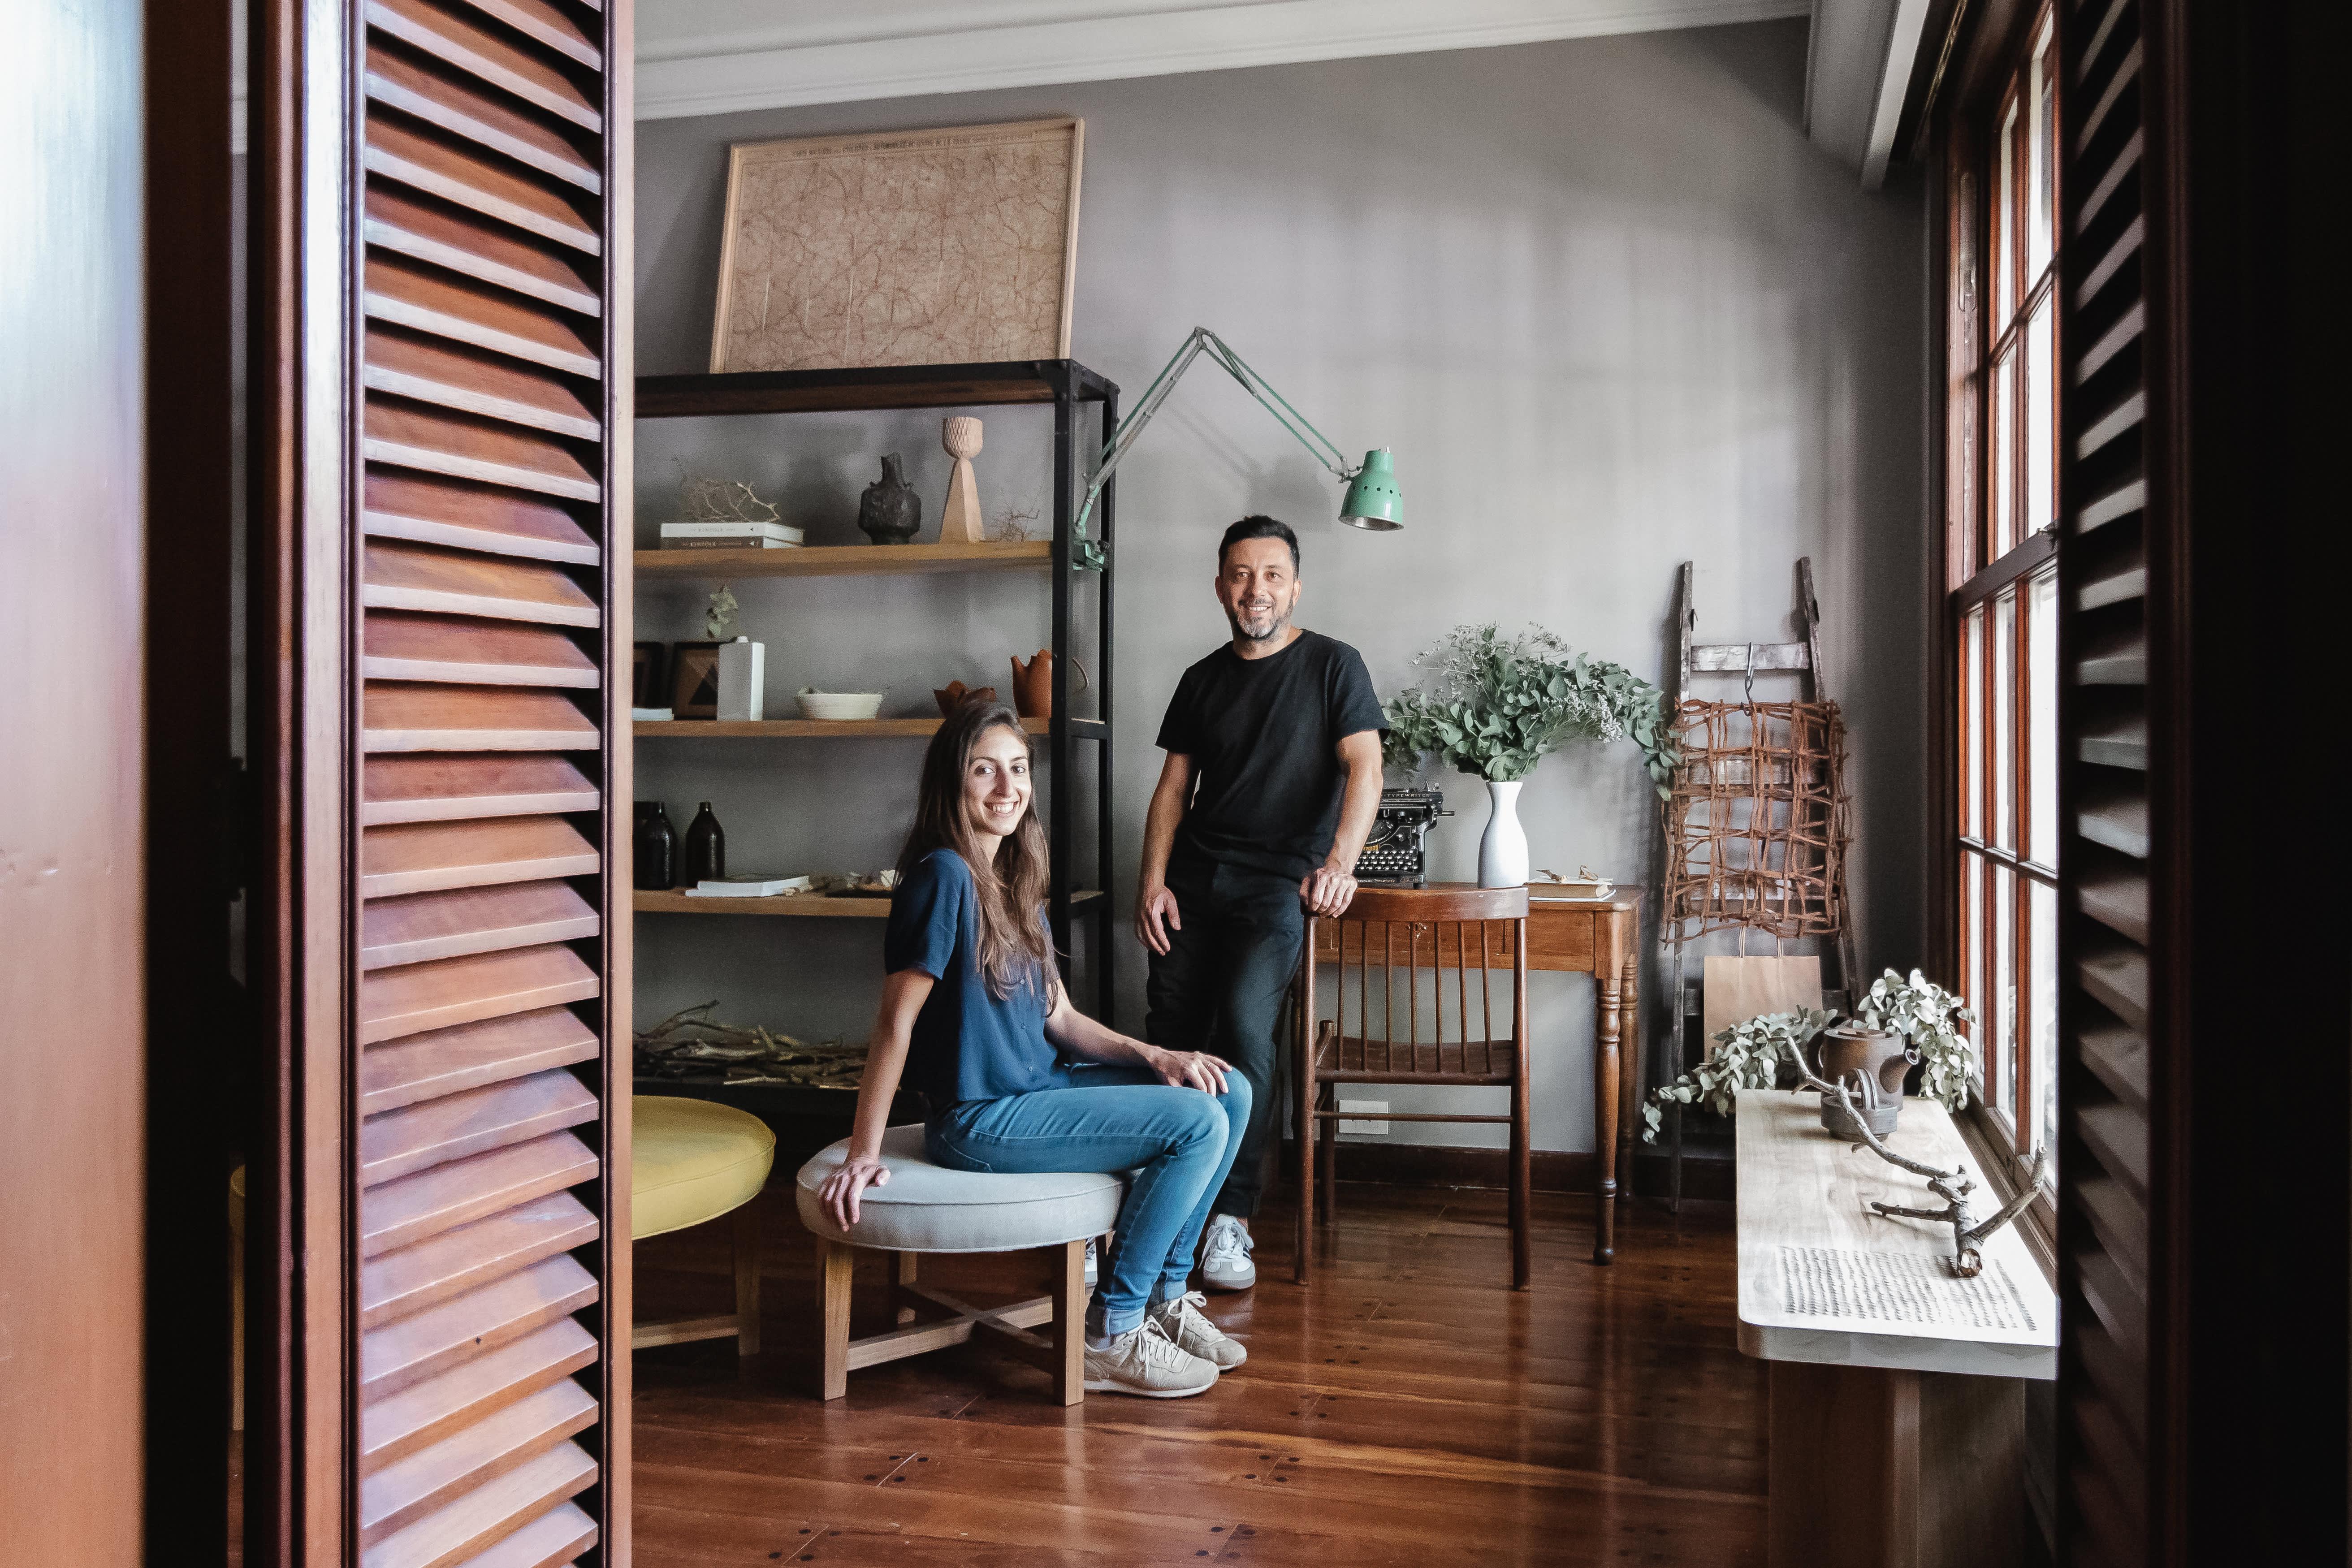 Interior Design | Apartment Therapy